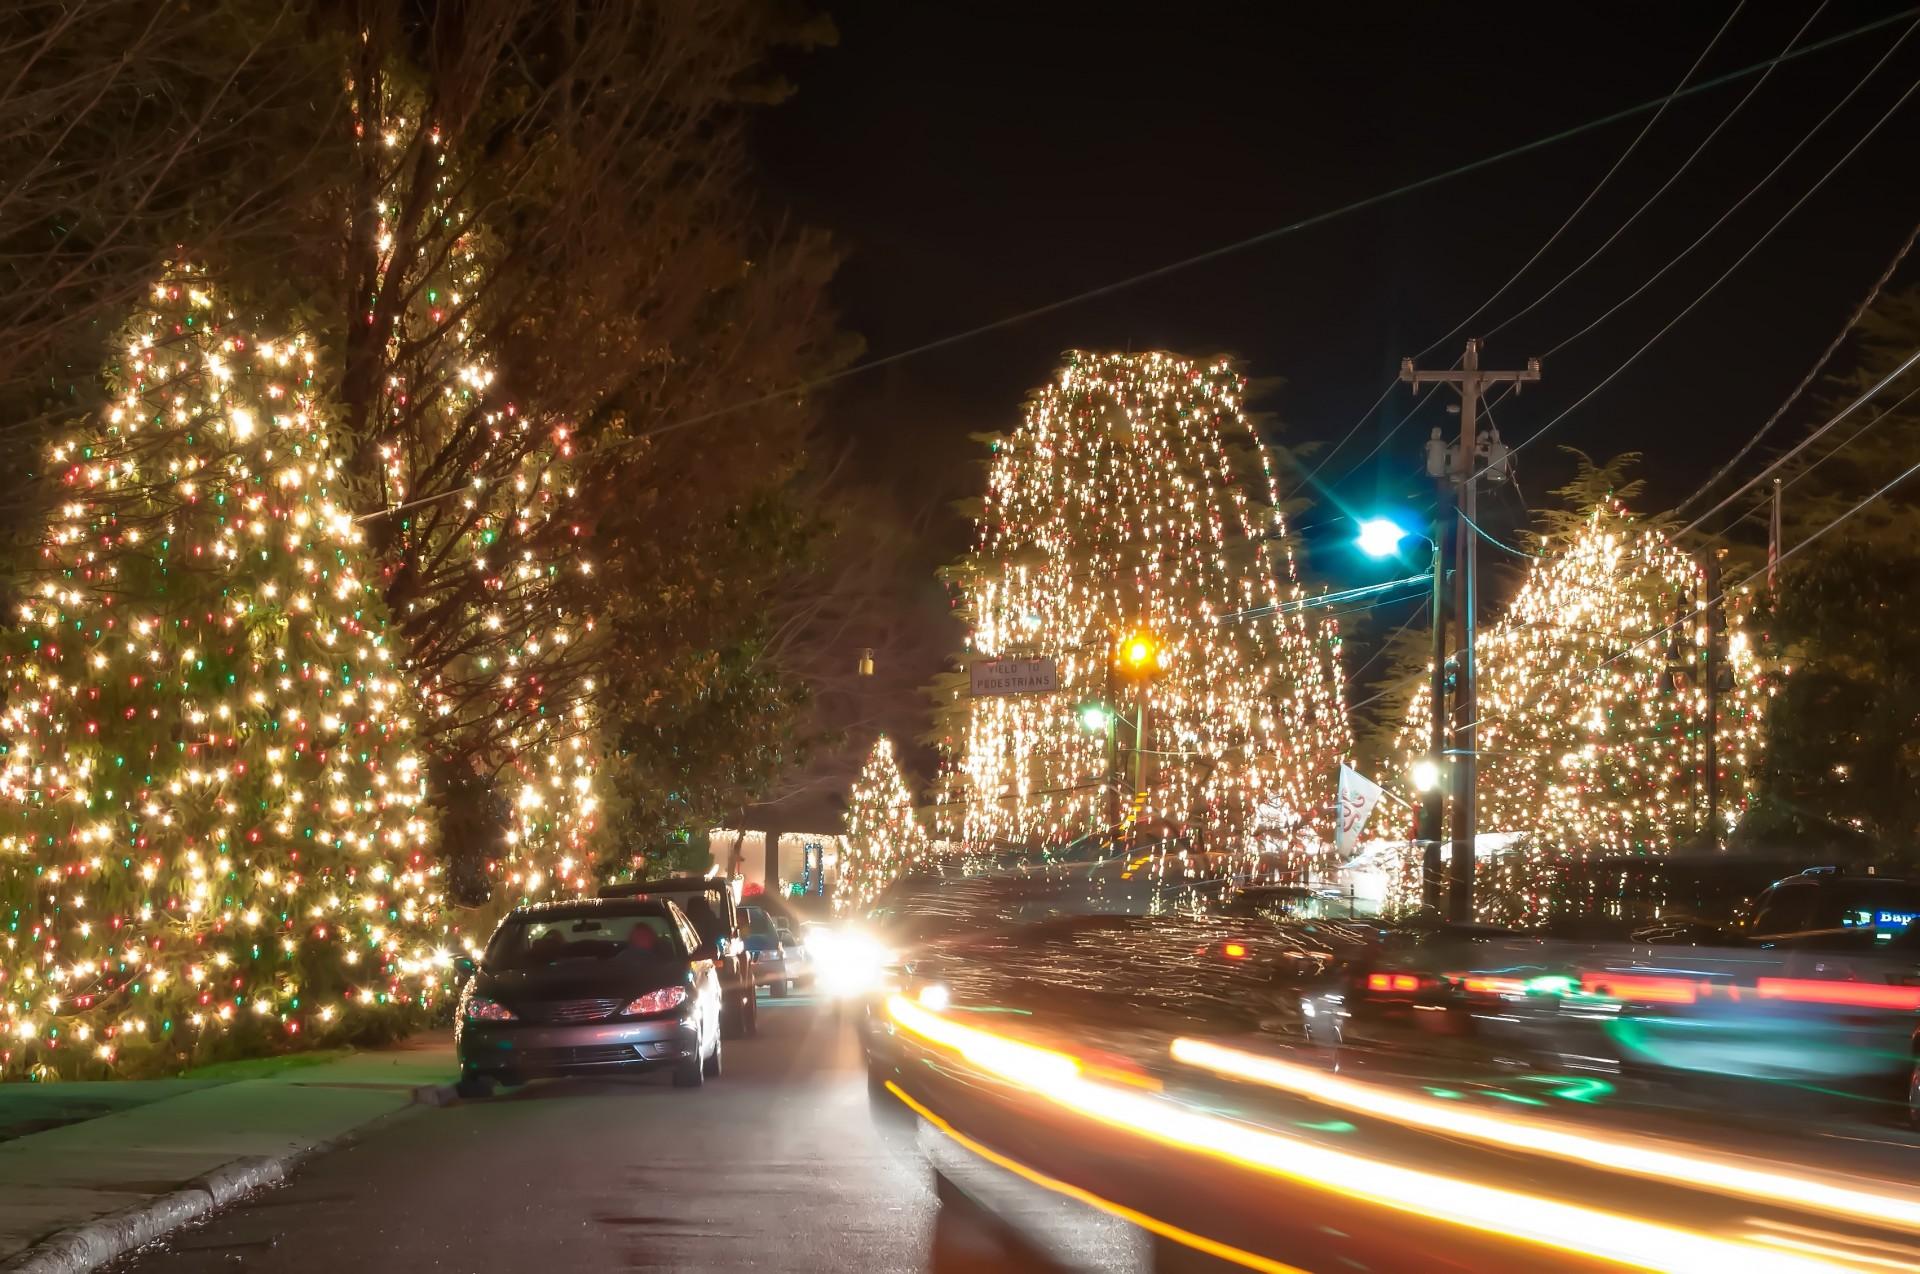 3d Digital Clock Wallpaper Christmas Town Usa At Night Free Stock Photo Public